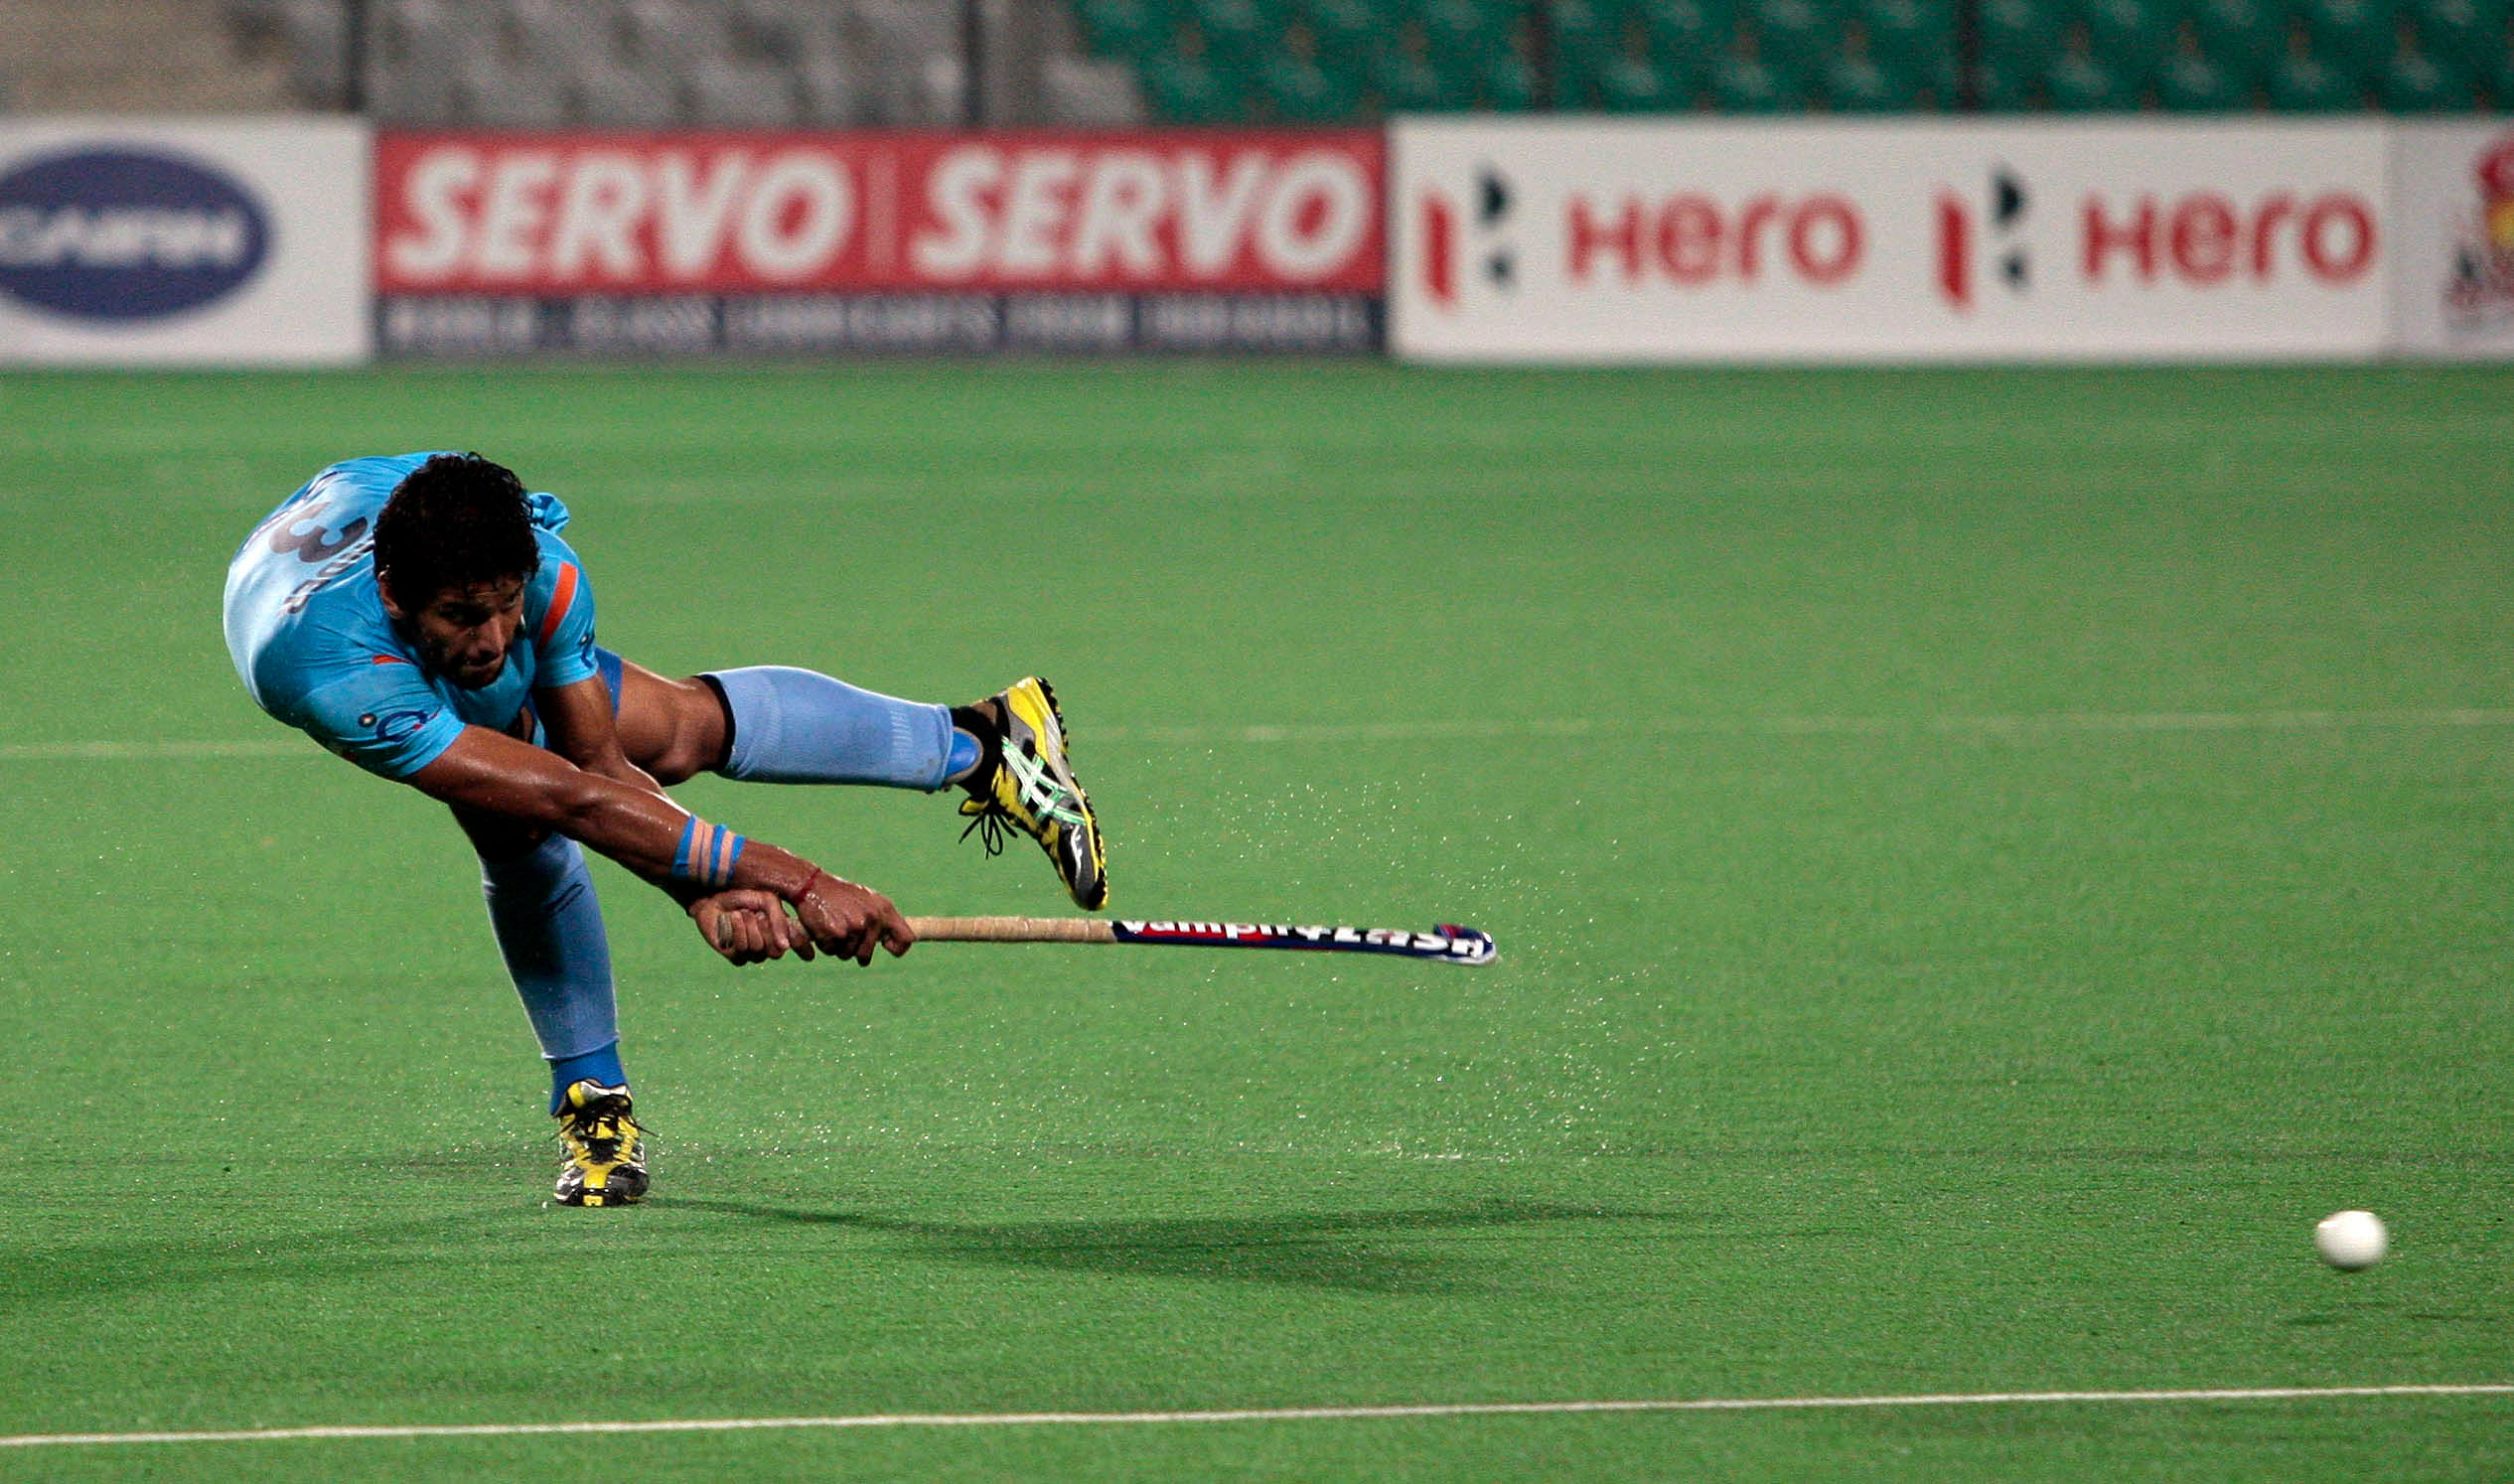 Commonwealth games india